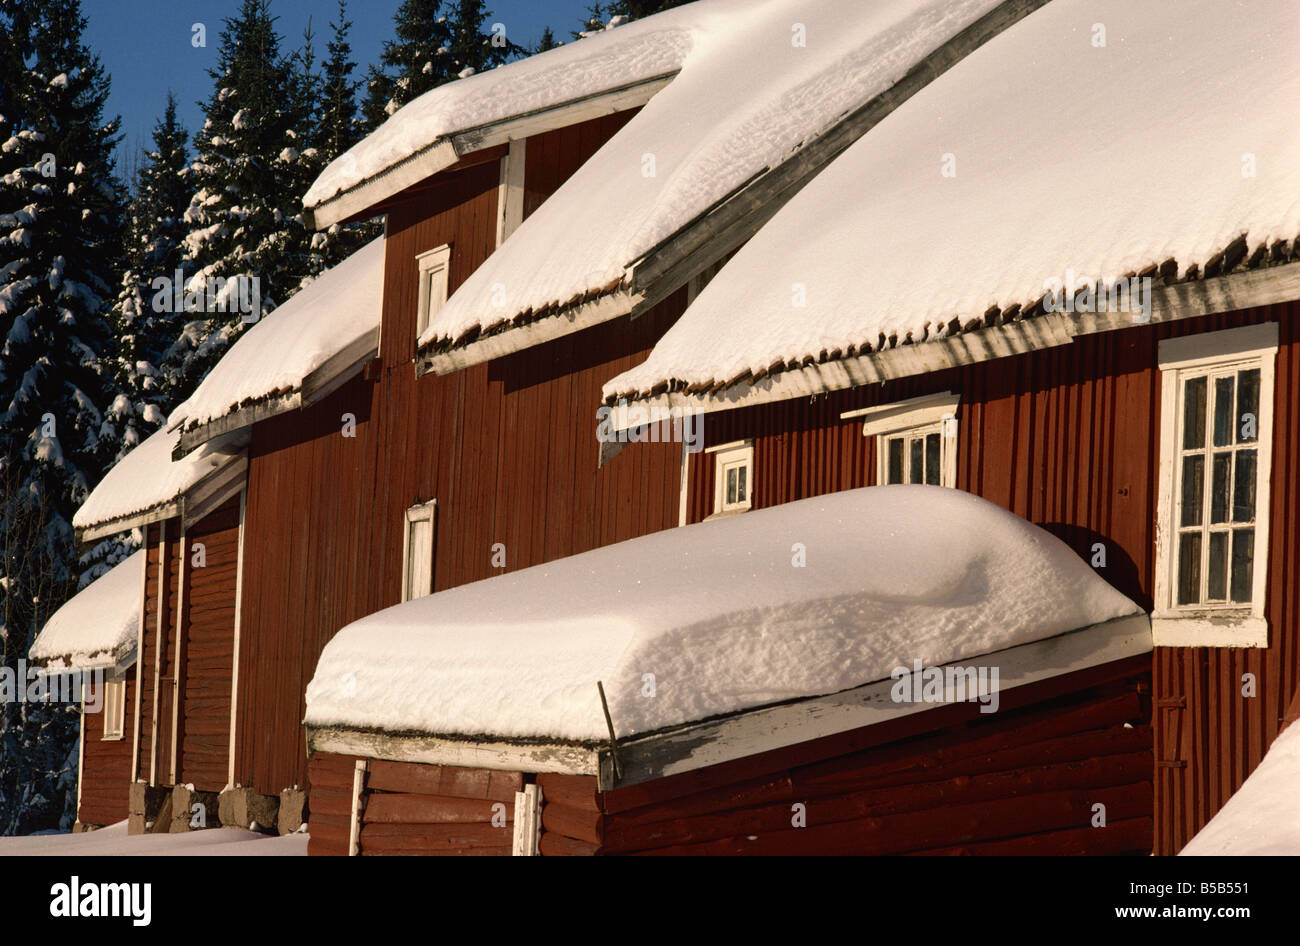 7a576c95 Barn at Lorenseter, Nordmarka, Oslo, Norway, Scandinavia, Europe ...